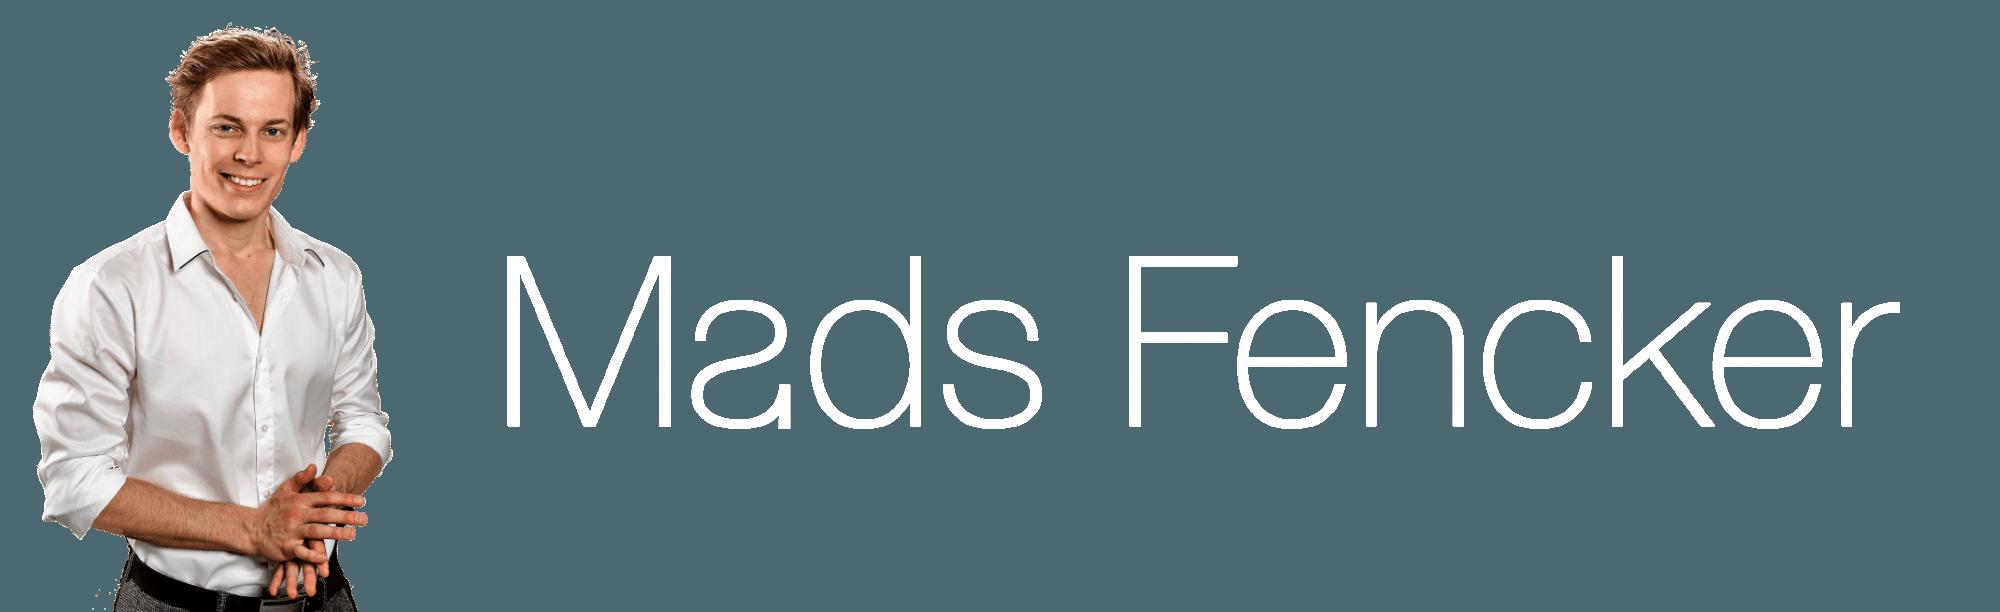 Mads Fencker - Underholdning